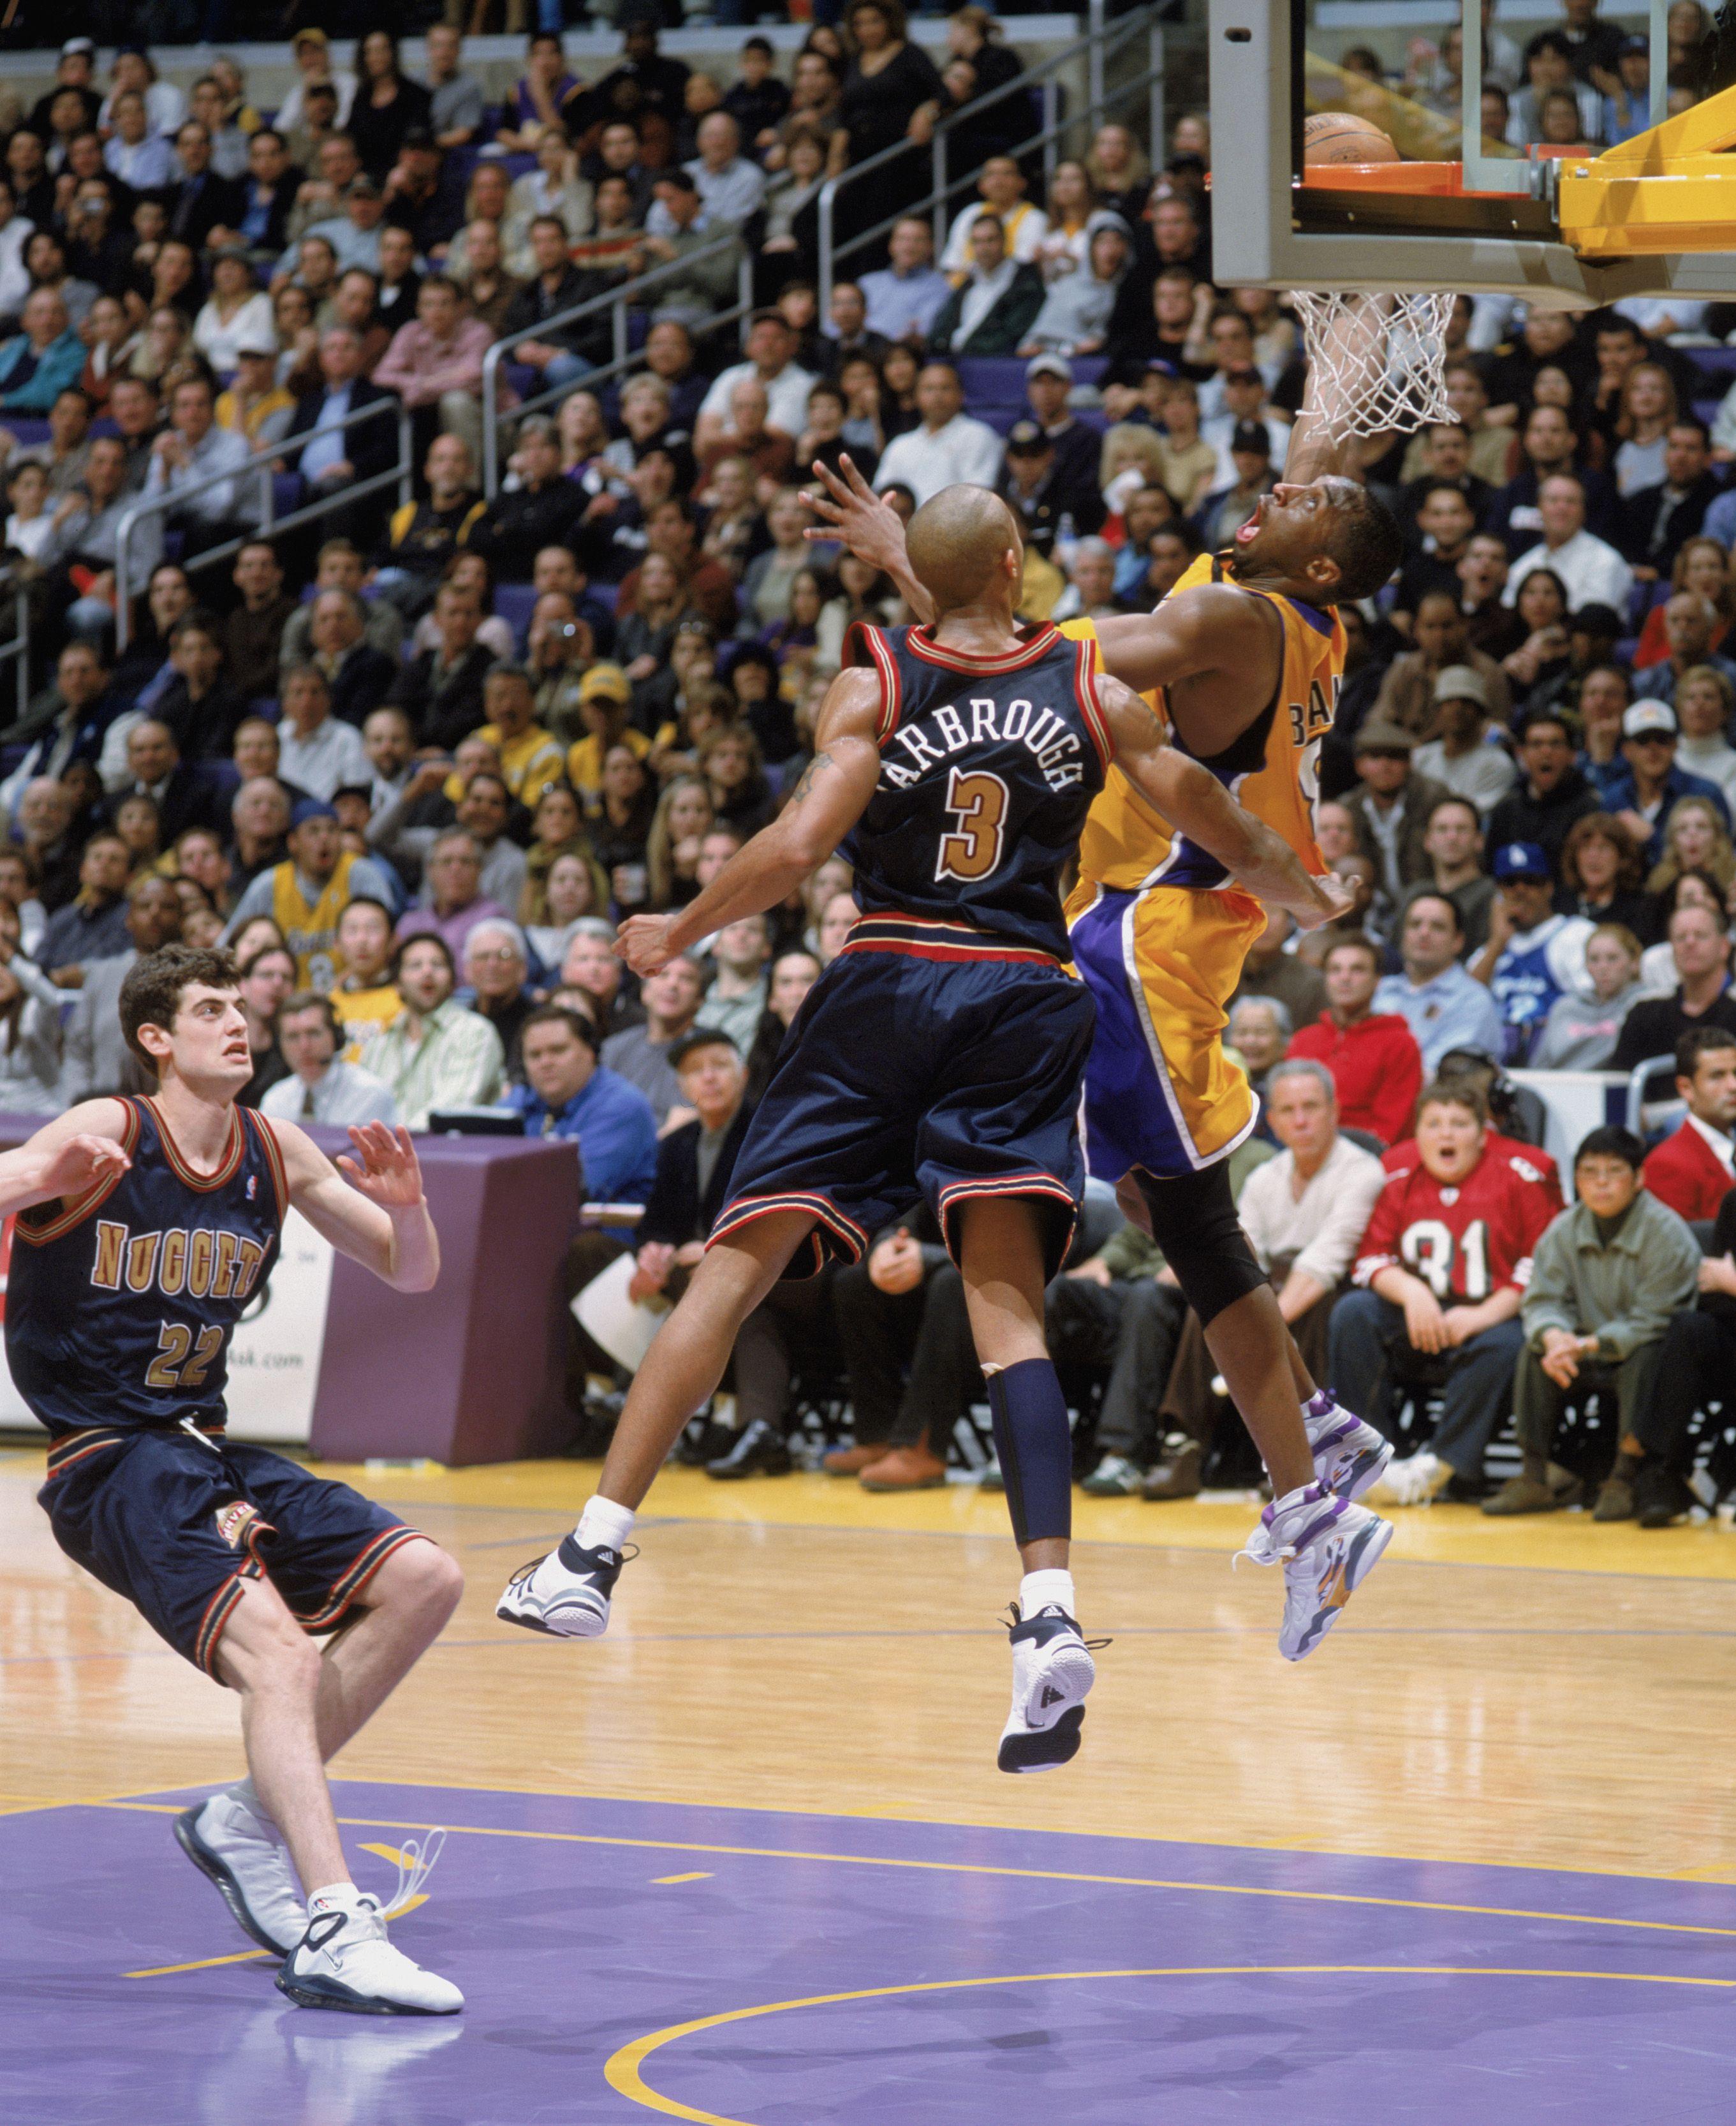 Kobe Bryant completes the 360 throwdown Javy tu nene (With